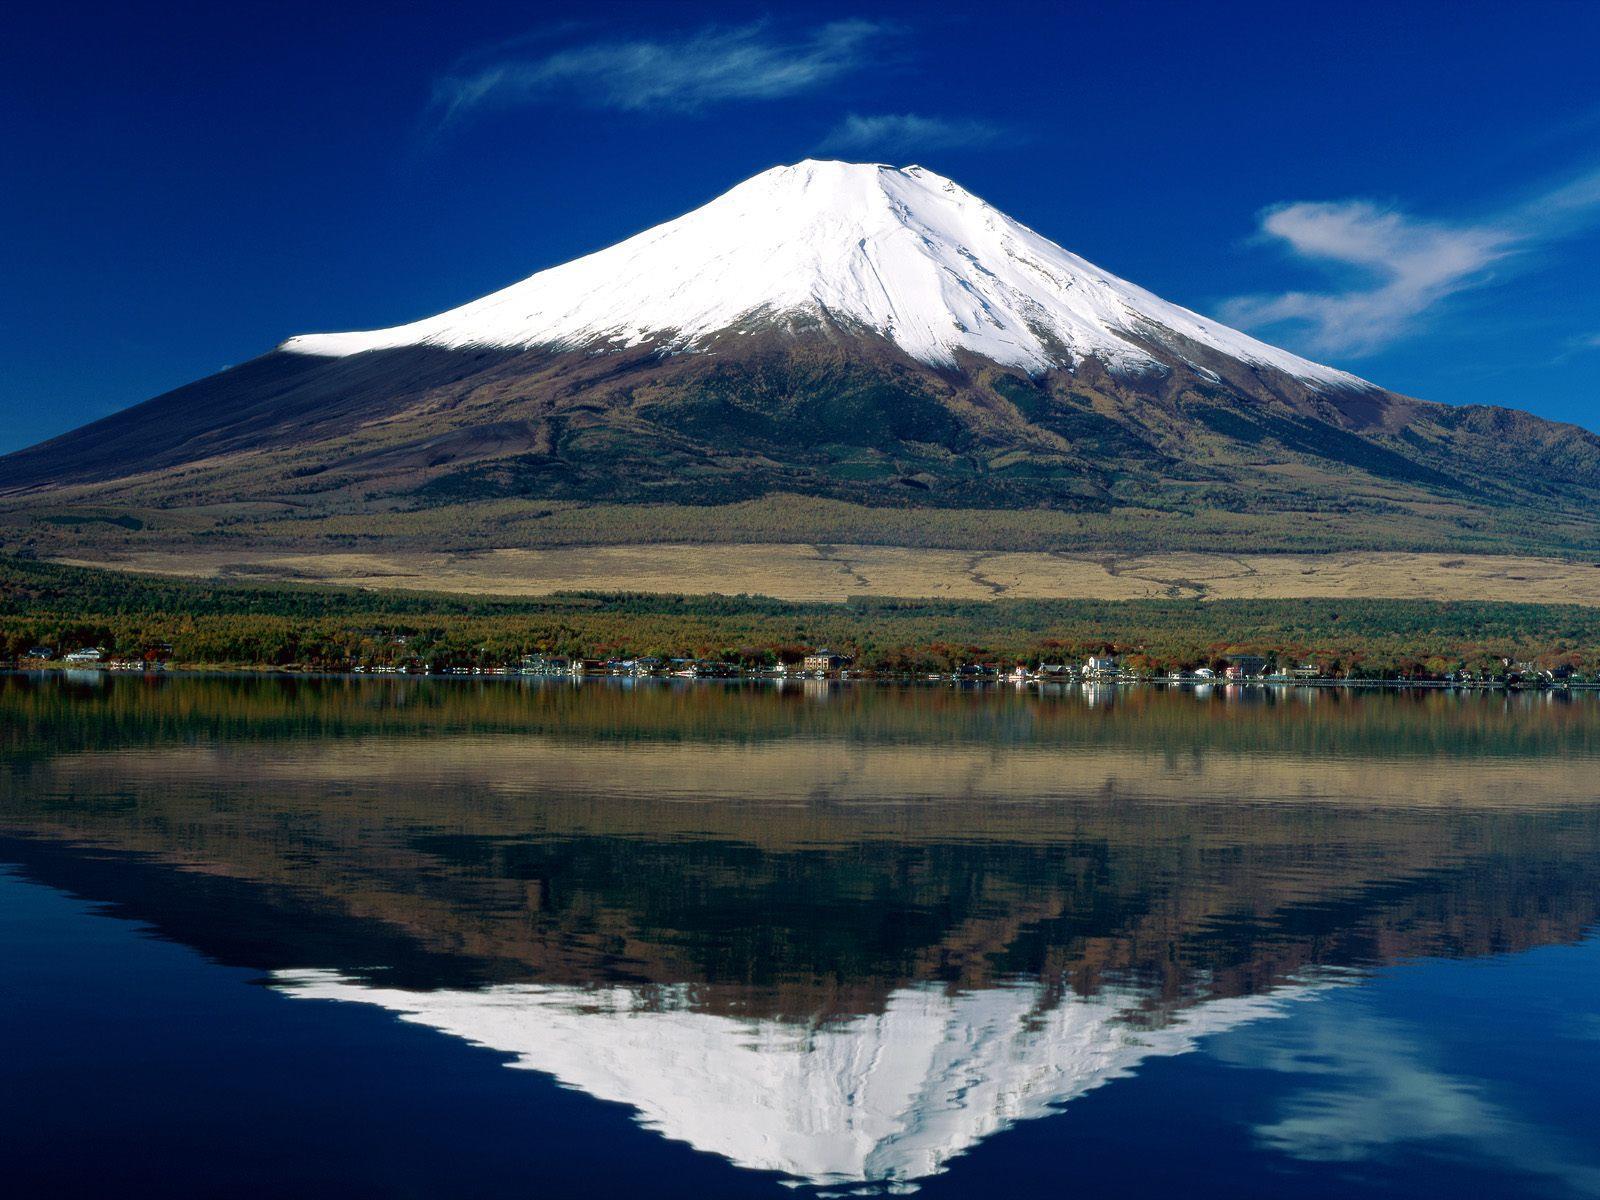 Mount_Fuji_Japan.jpg